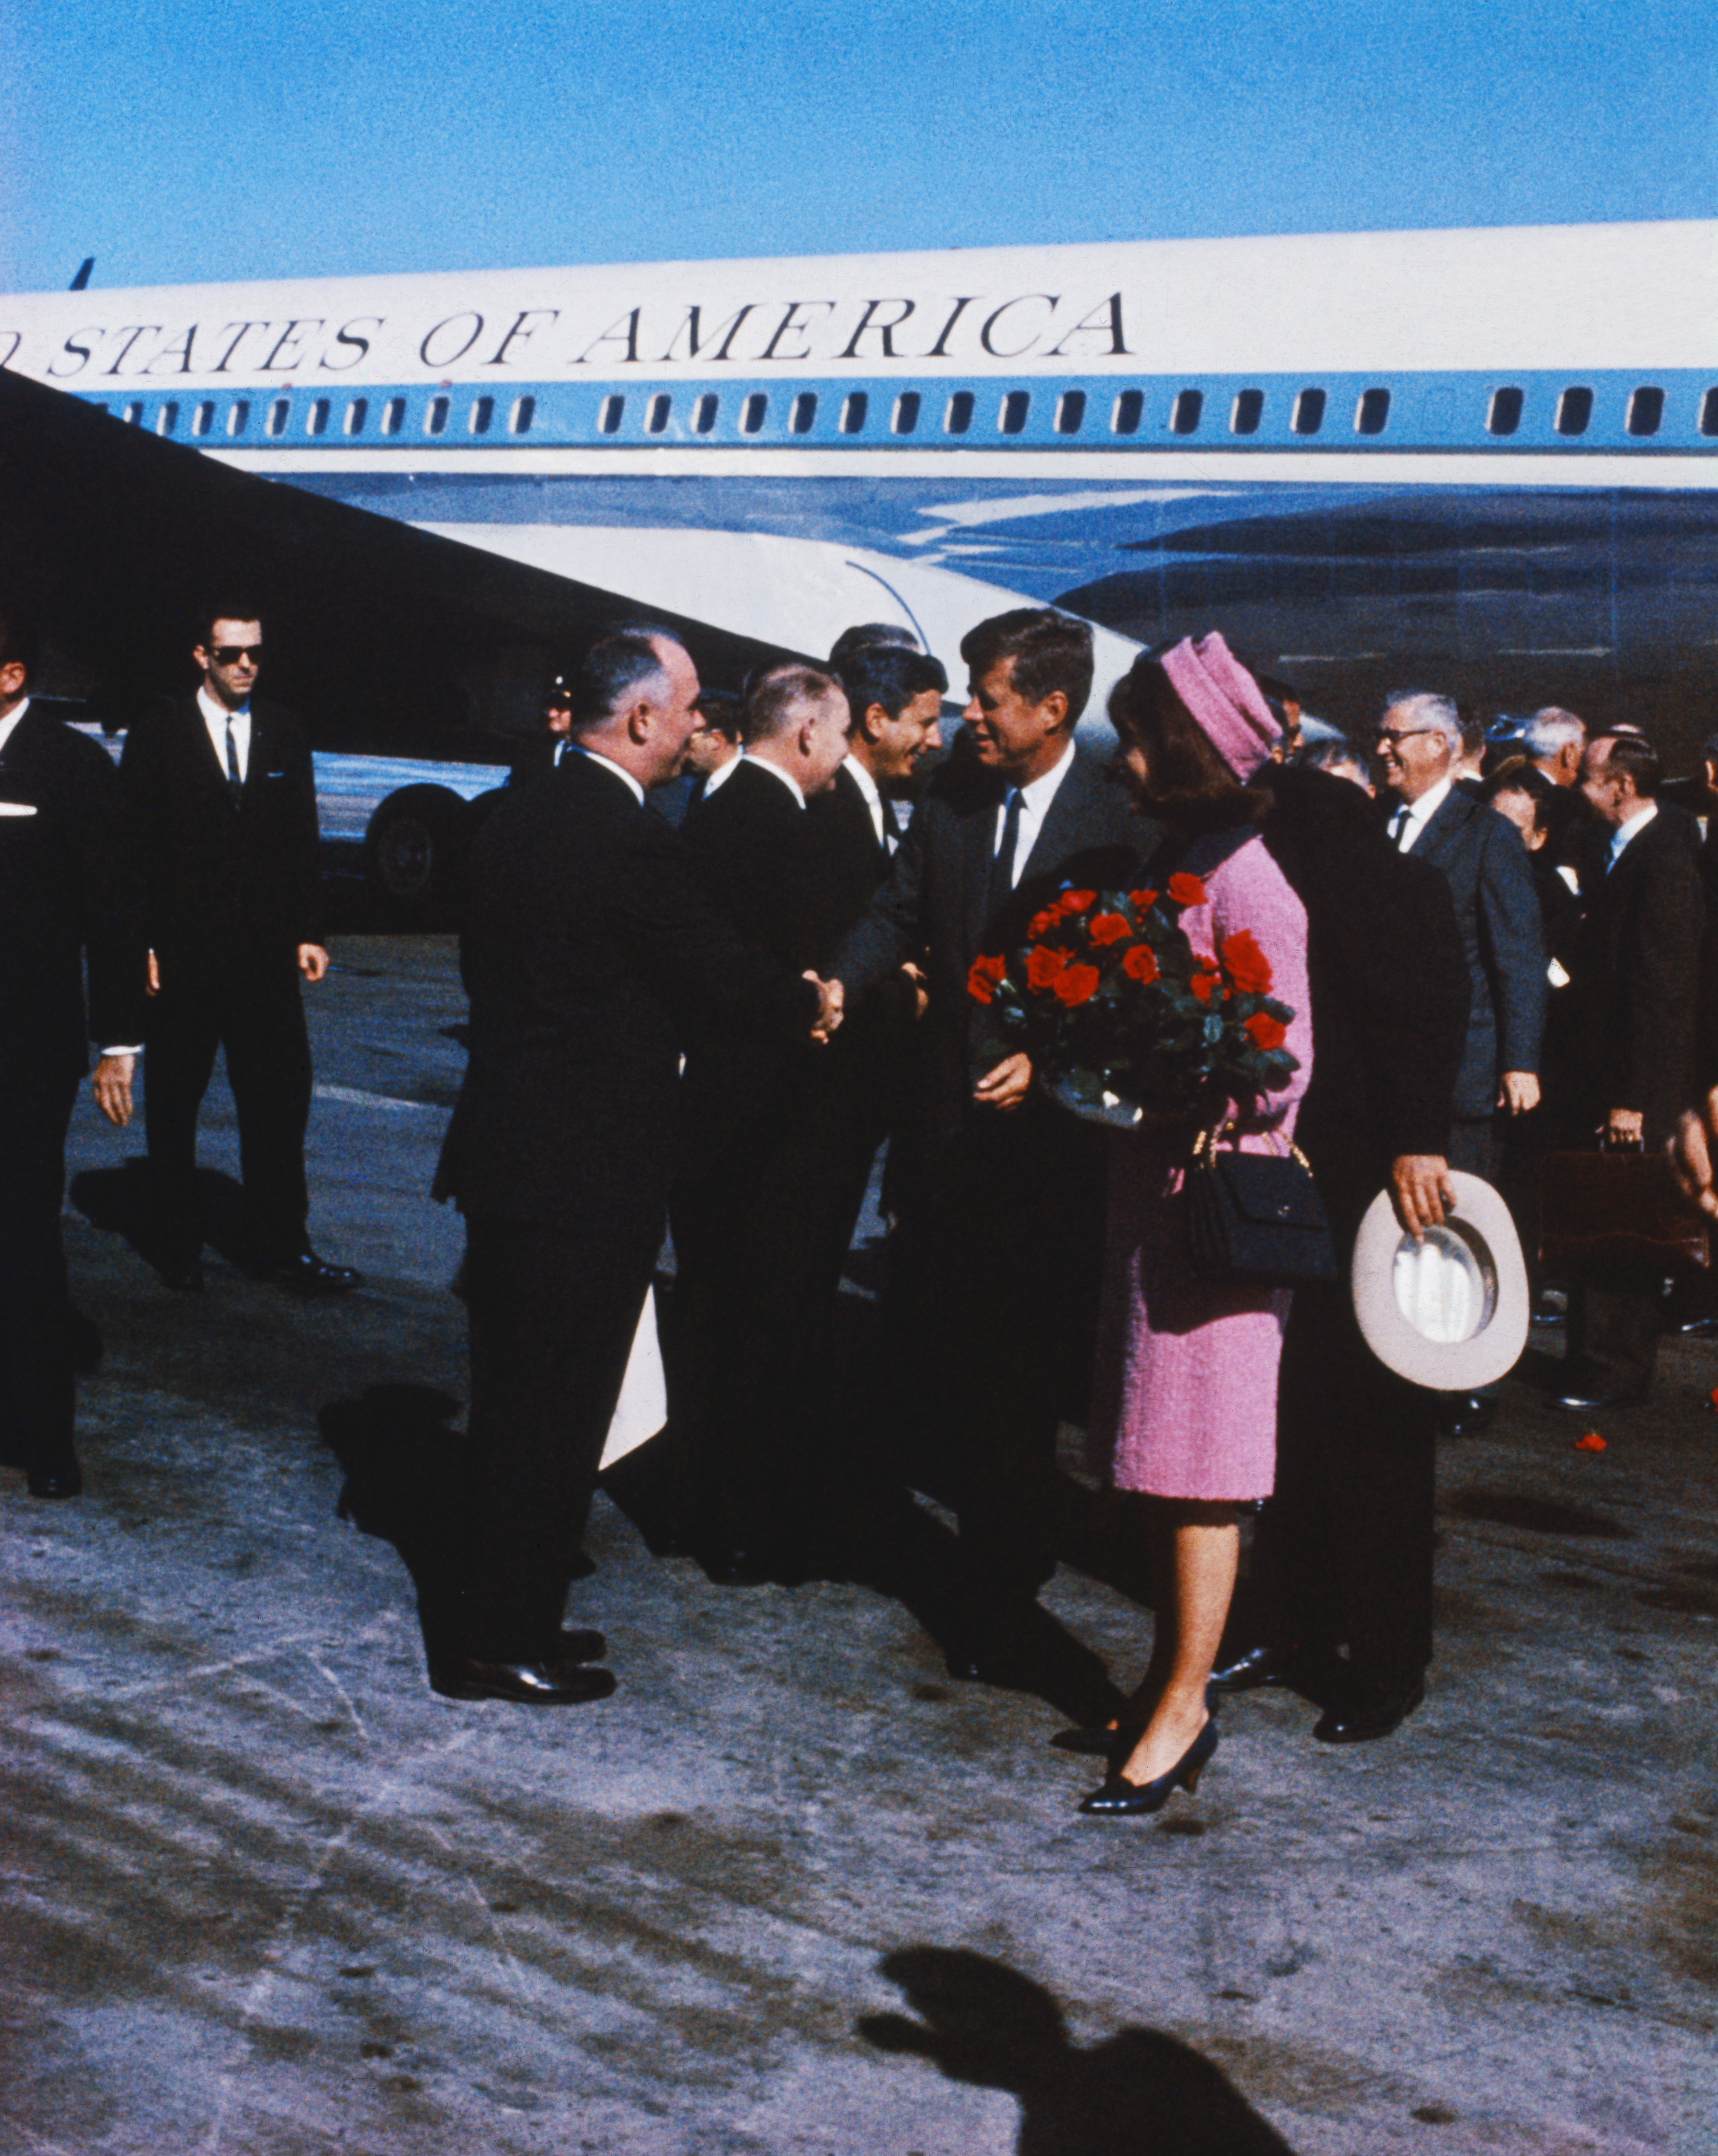 a history of the assassination of president john f kennedy John c calhoun: he  controversy has swirled around president john f kennedy's assassination:  such as the assassination of us president john f kennedy.